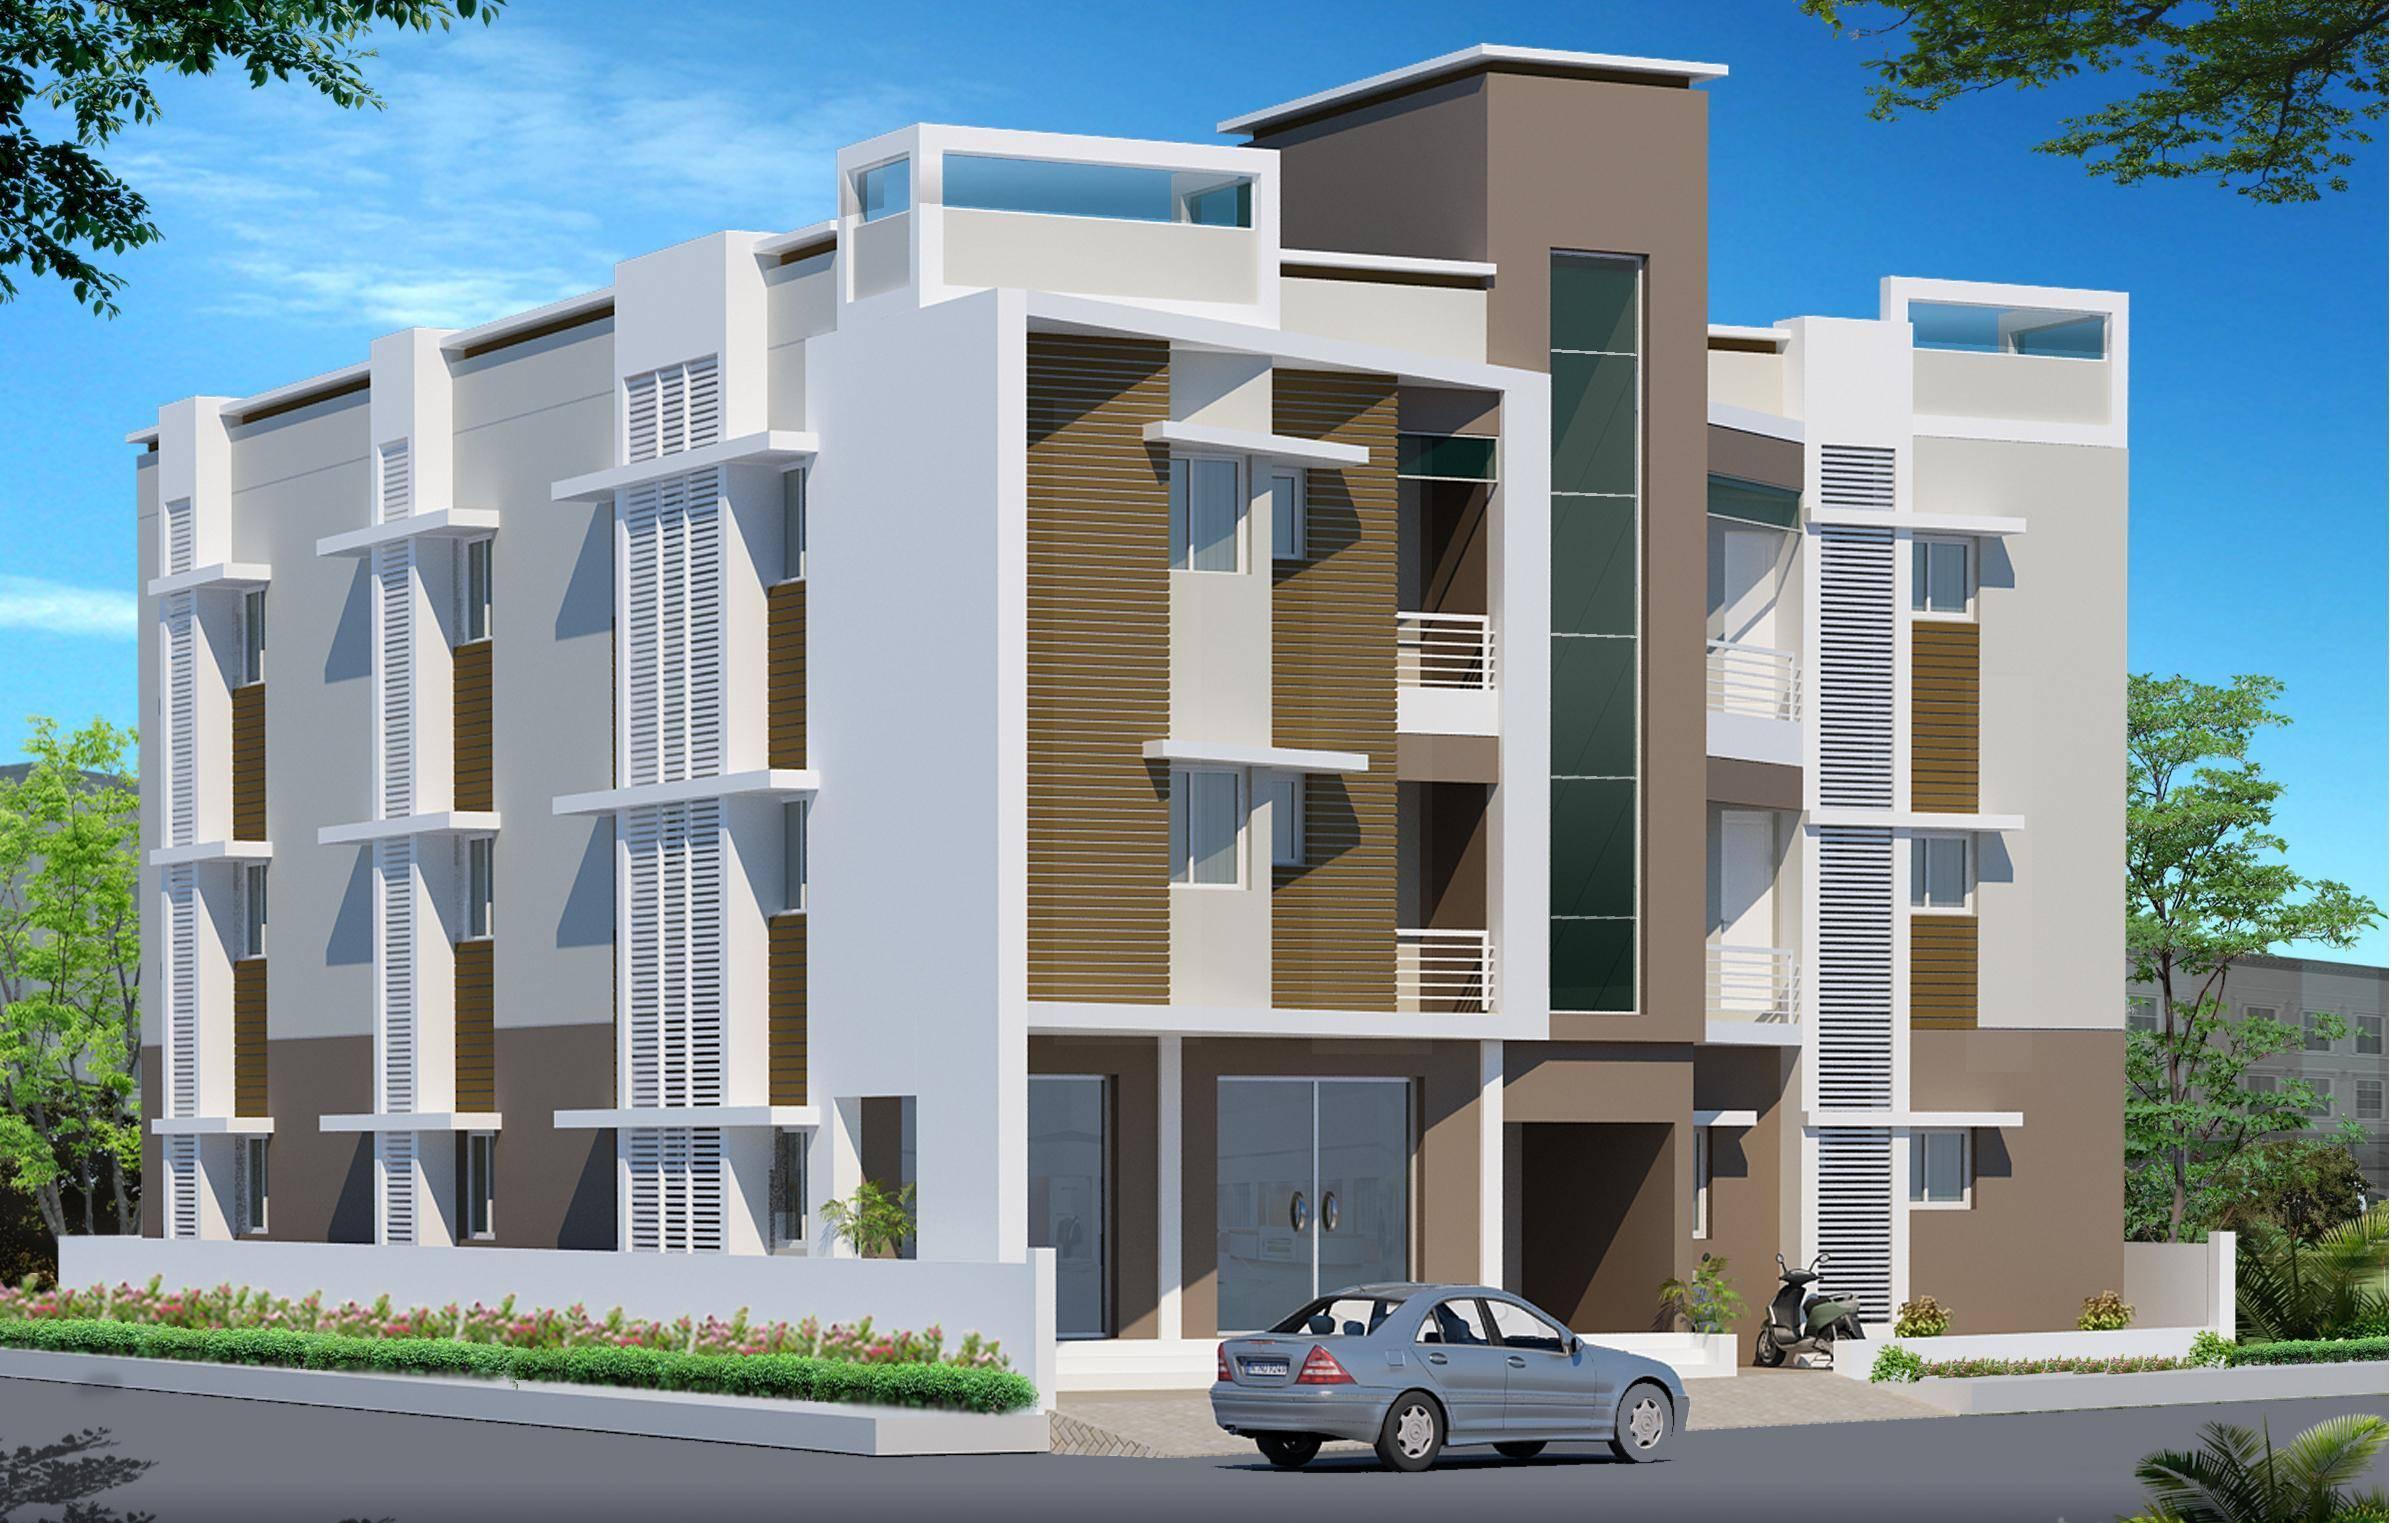 Storey Residential Building Design Top